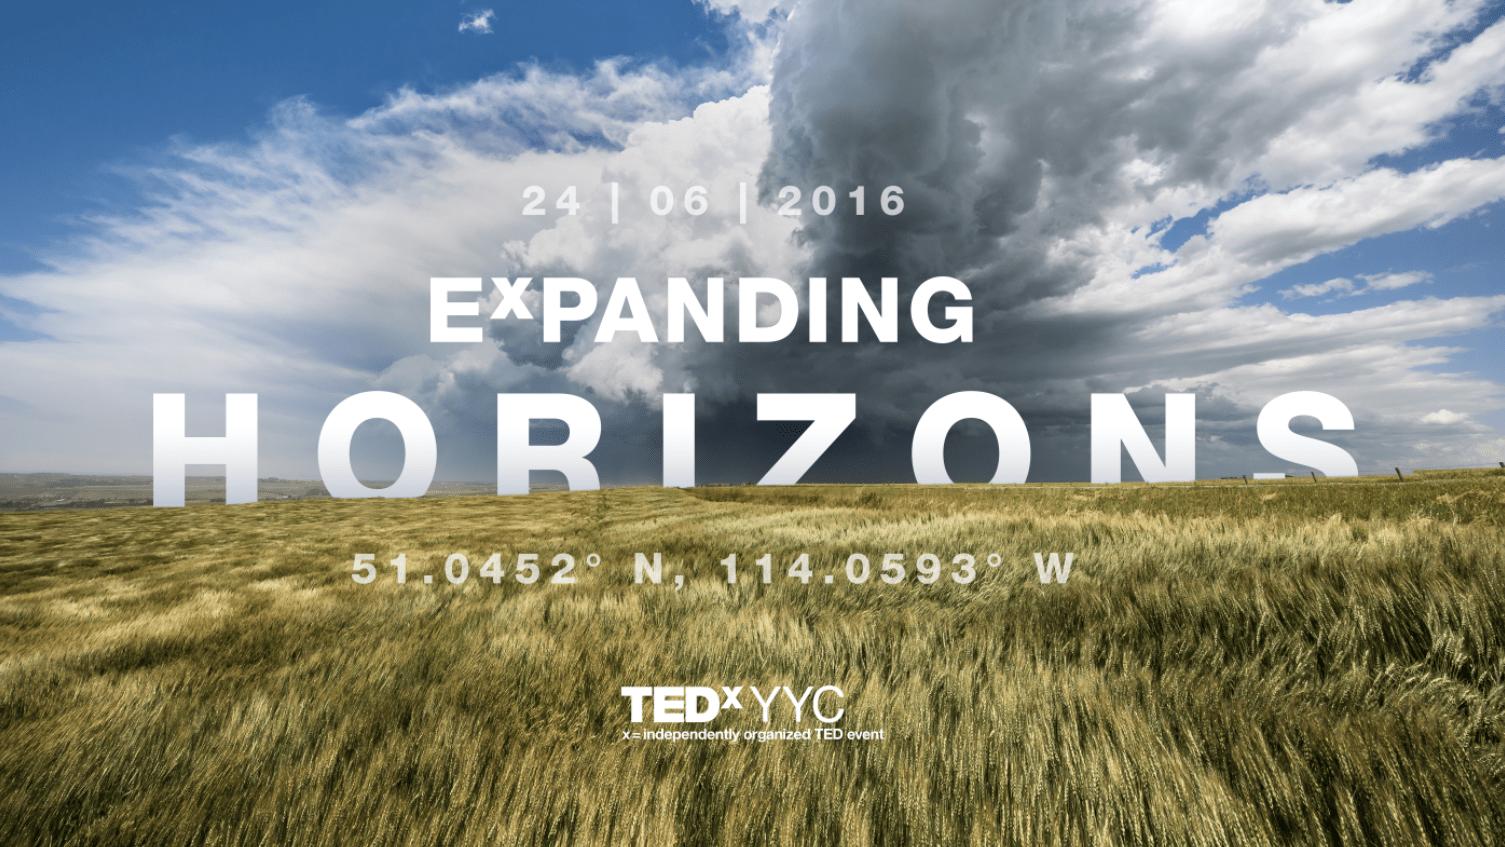 TEDxYYC 2016 is Expanding Horizons